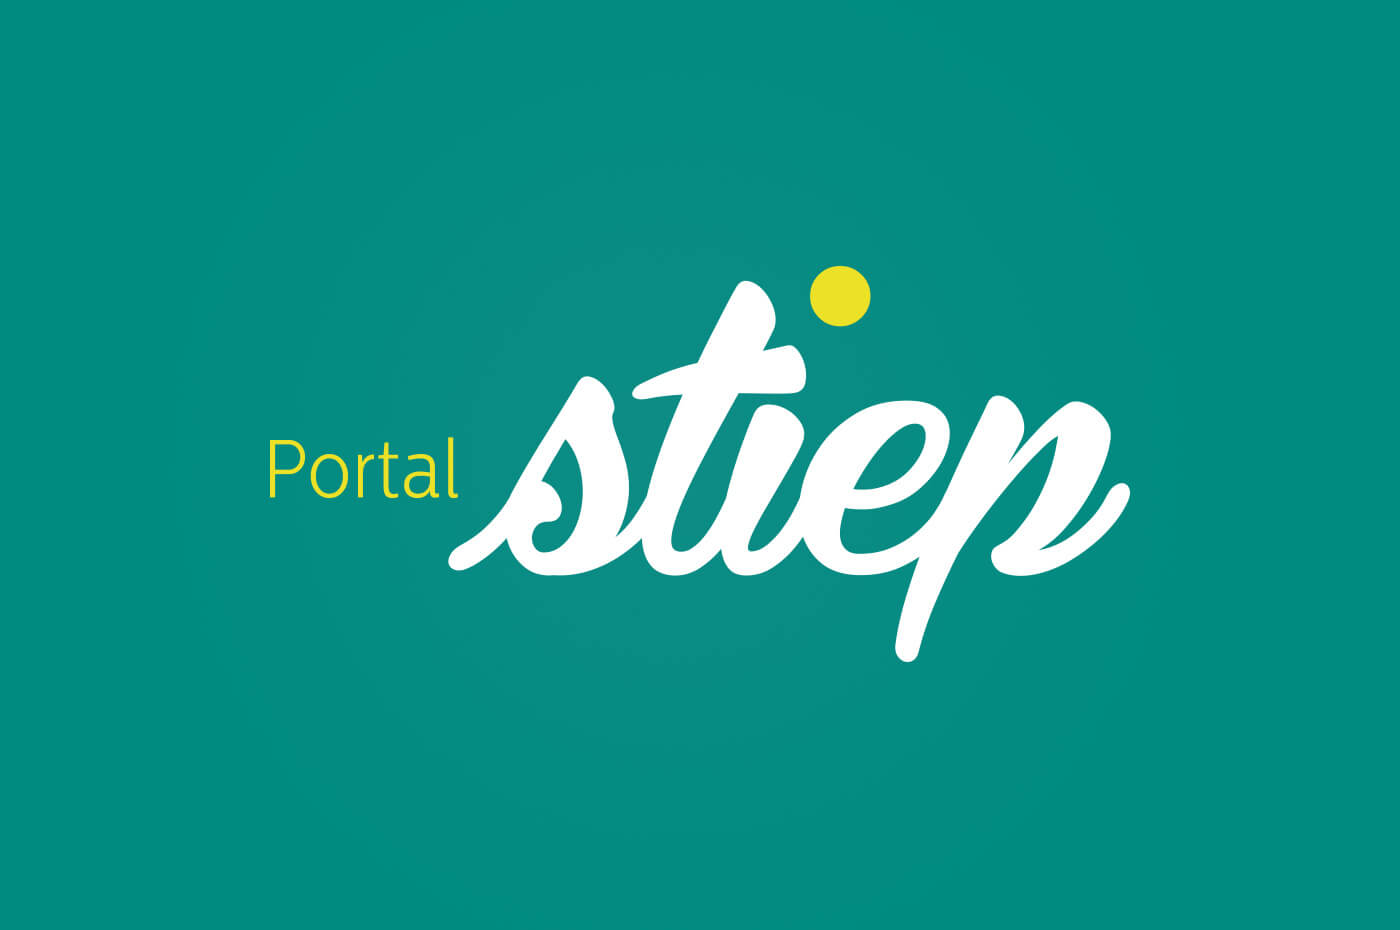 https://www.rafaeloliveira.com/portfolio/portal-stiep